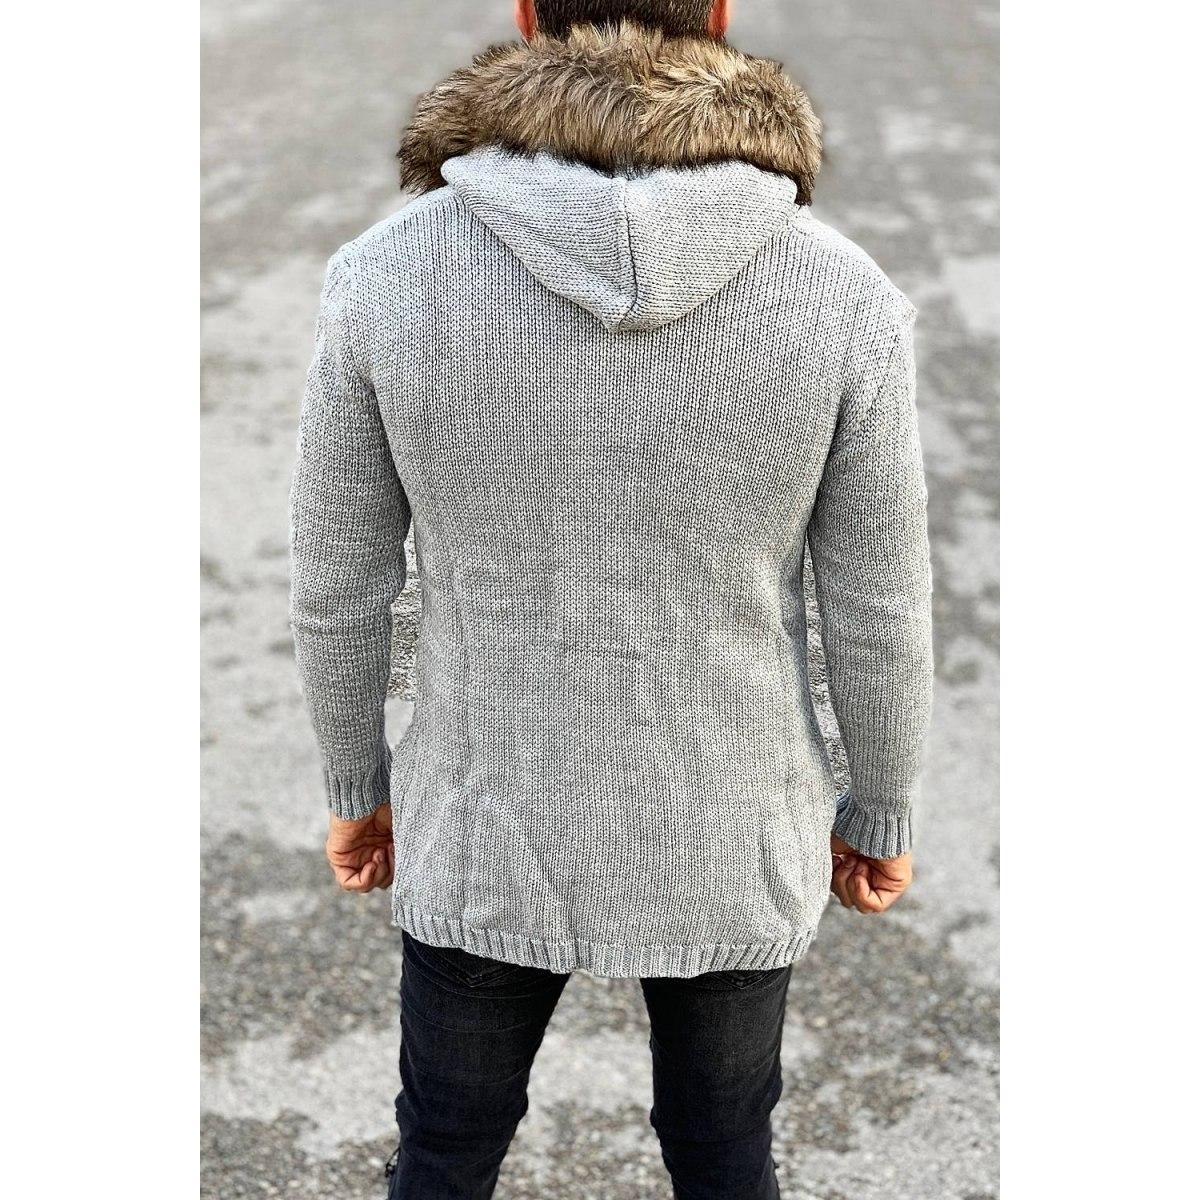 Rough Pattern Fur-Hood Cardigan Jacket in Grey Mv Premium Brand - 3